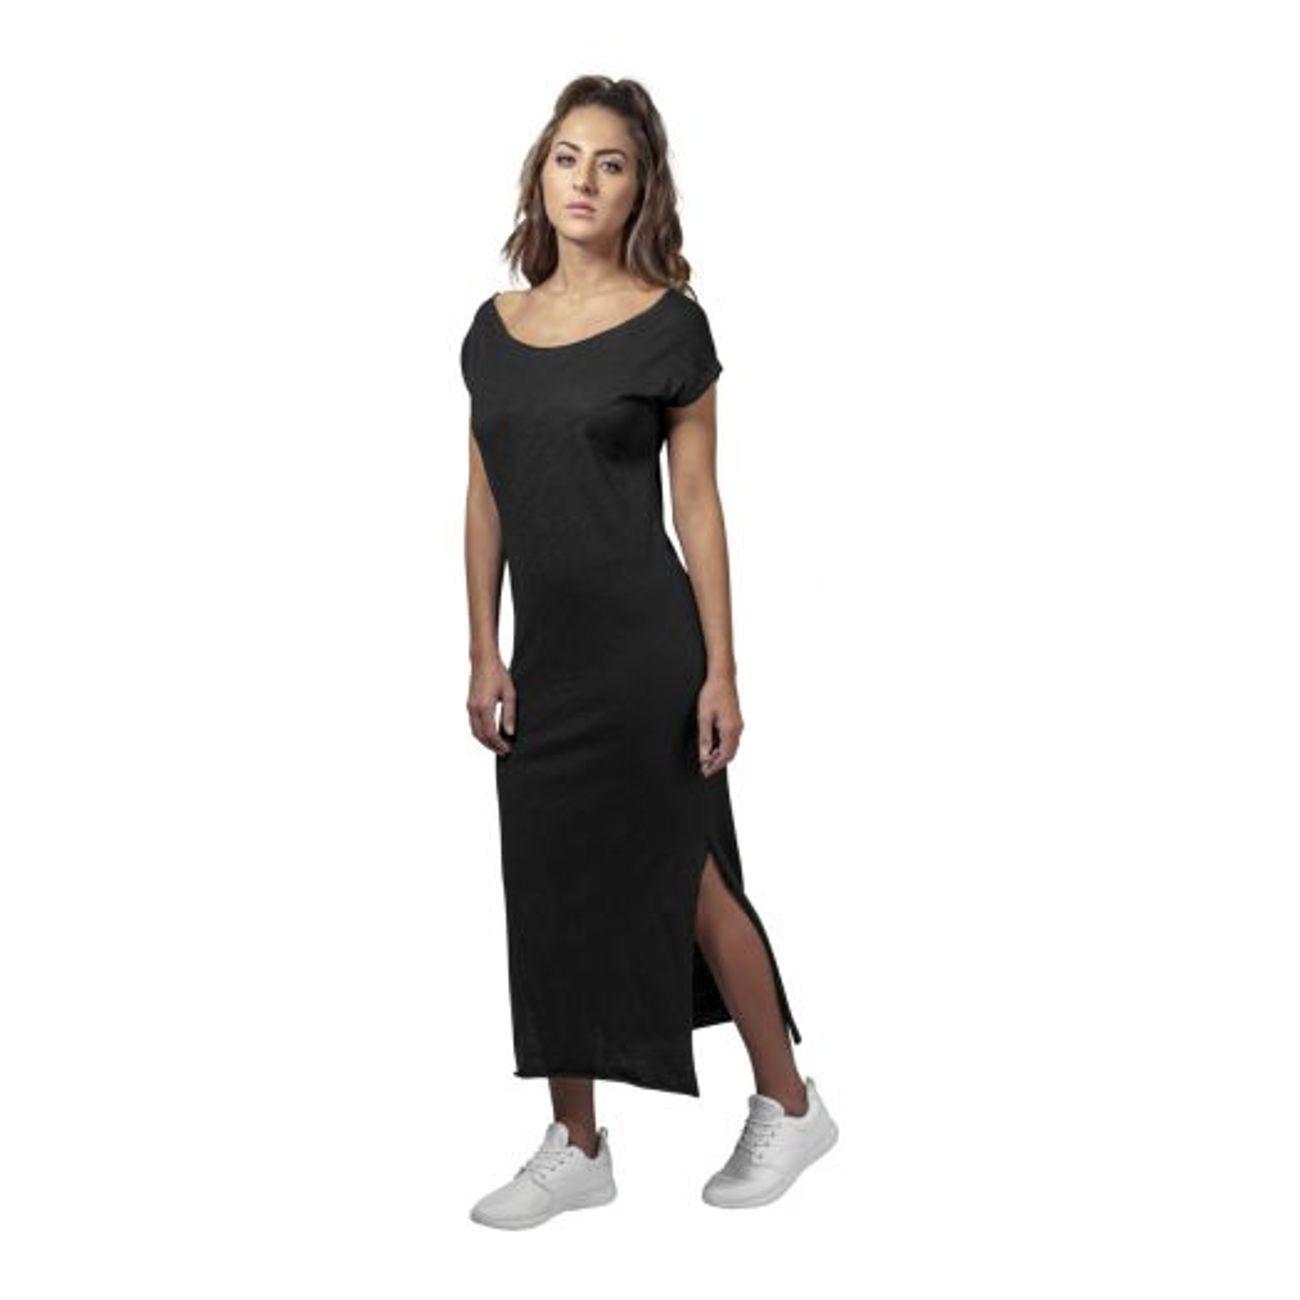 8a23fe71903 Mode- Lifestyle femme URBAN CLASSICS Robe Longue Urban Classics Slub Dress  Noir ...